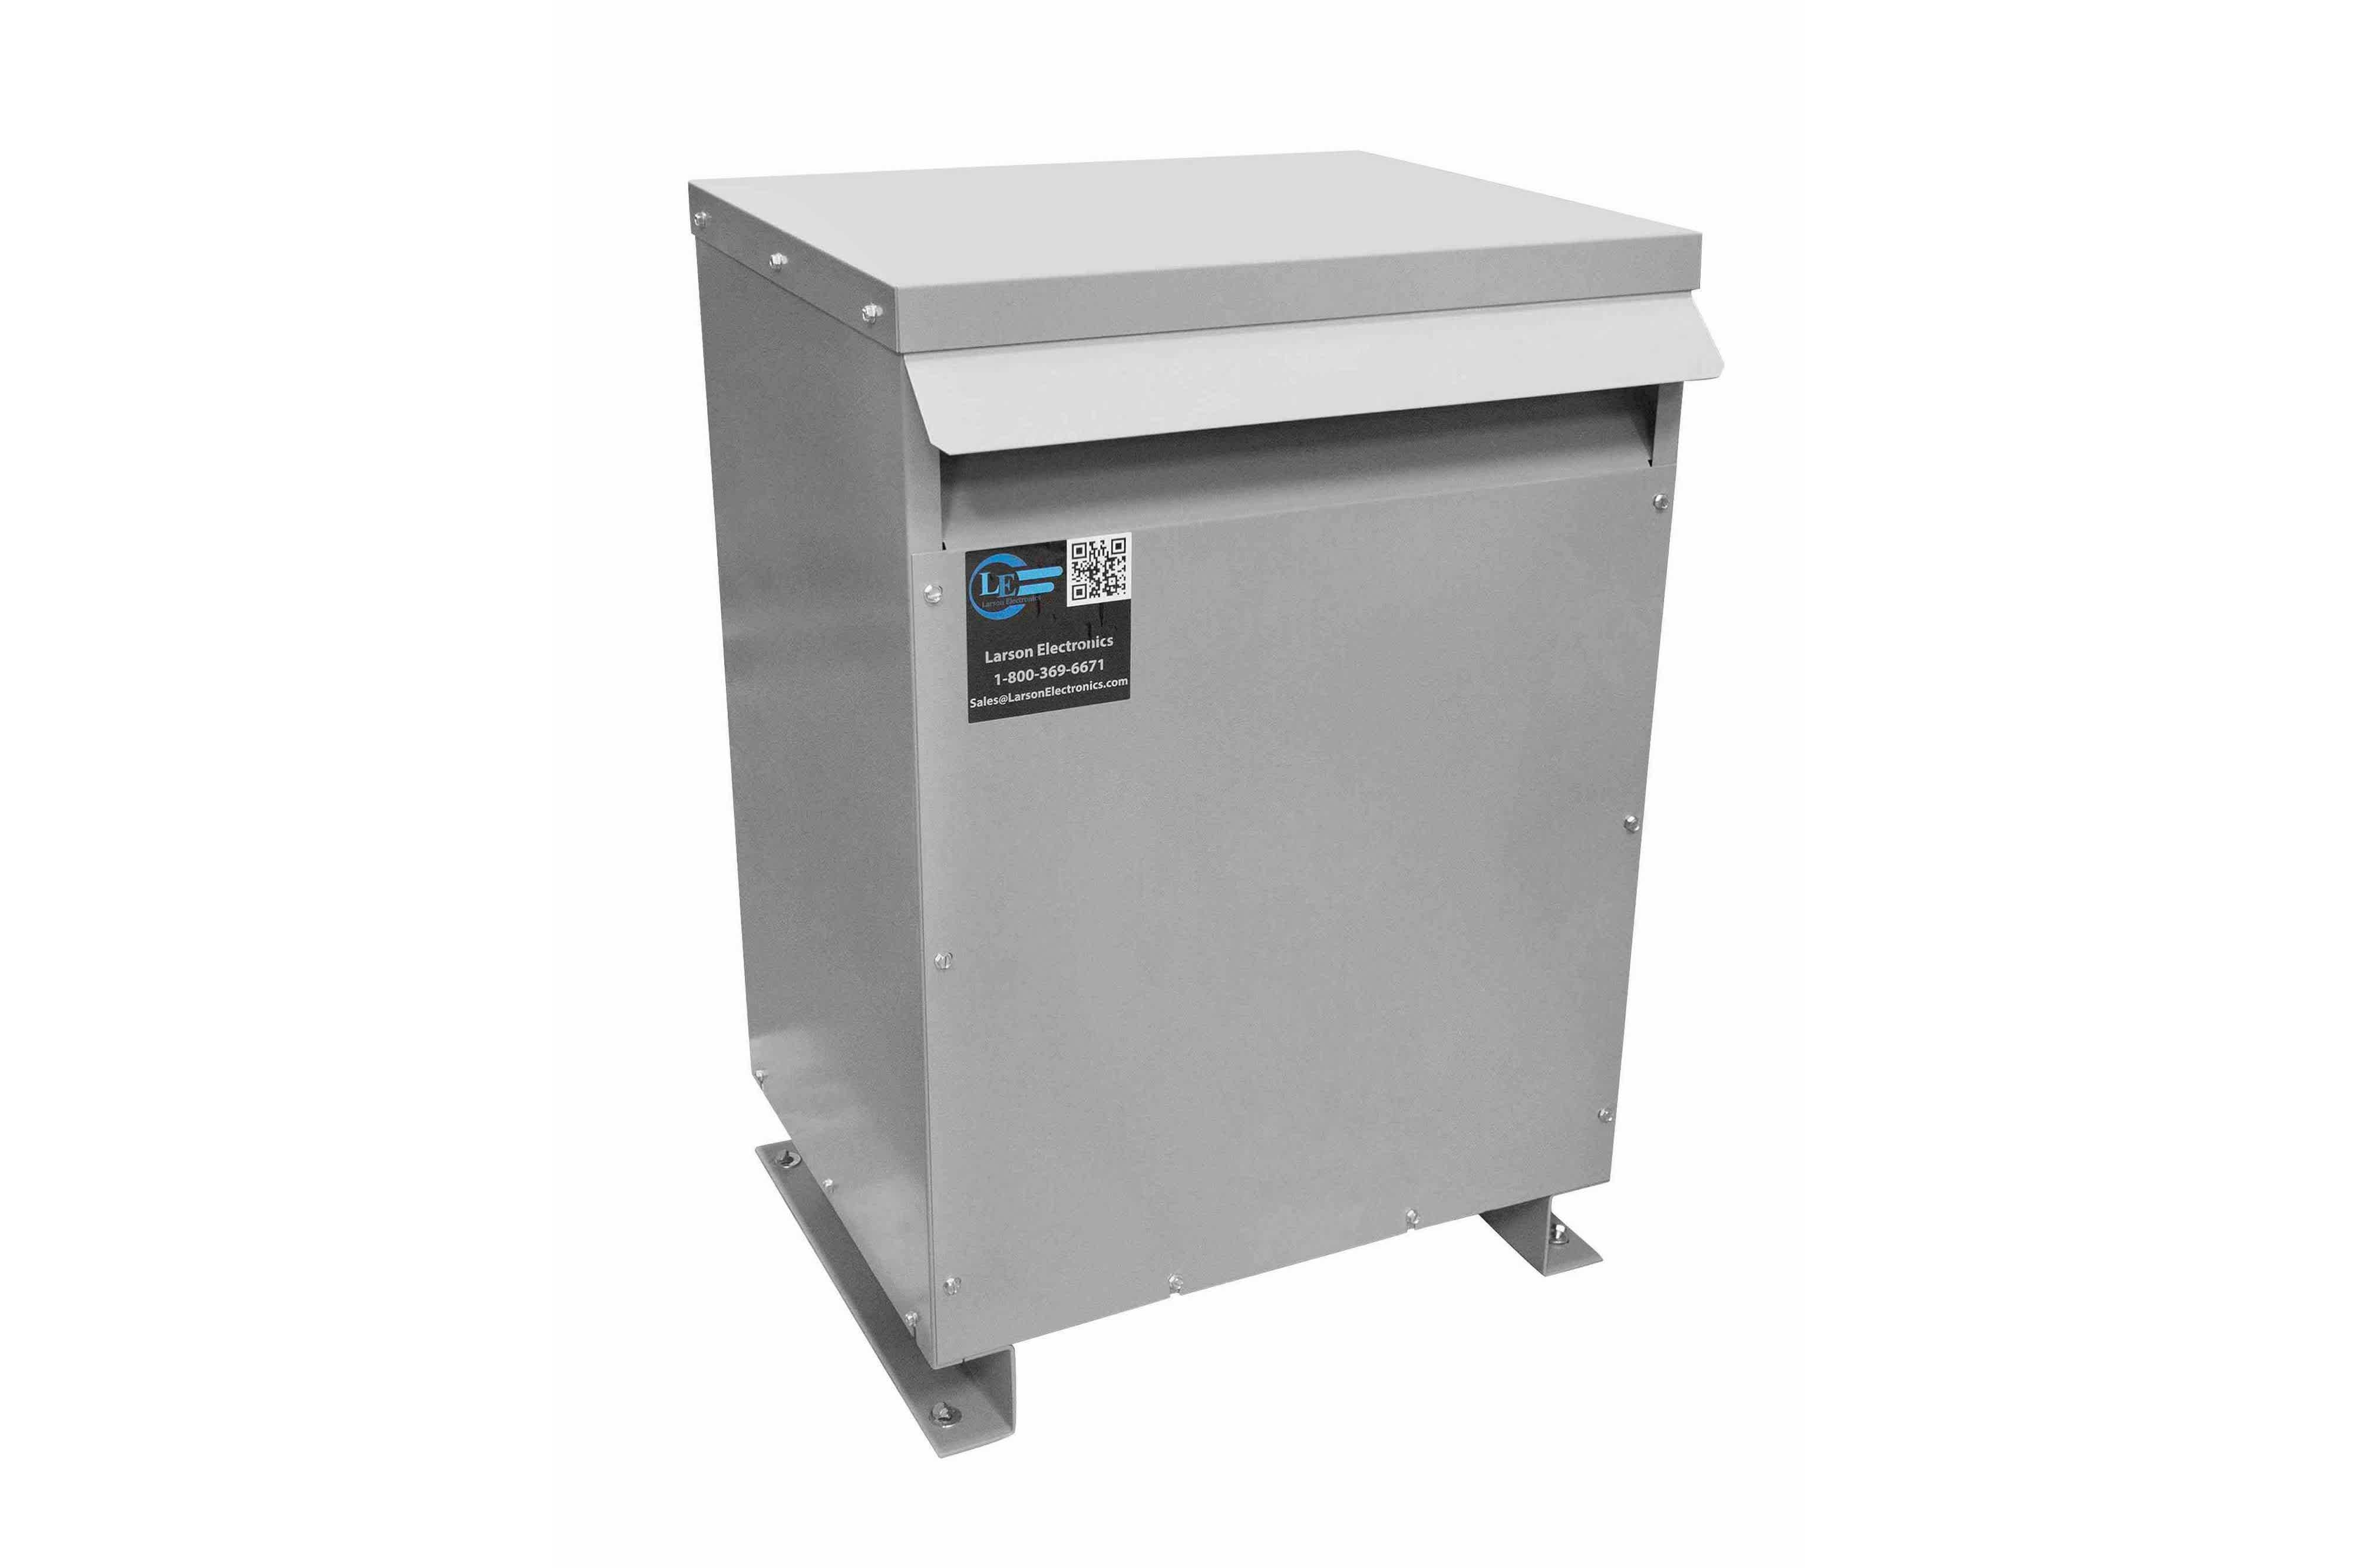 110 kVA 3PH Isolation Transformer, 380V Wye Primary, 480Y/277 Wye-N Secondary, N3R, Ventilated, 60 Hz